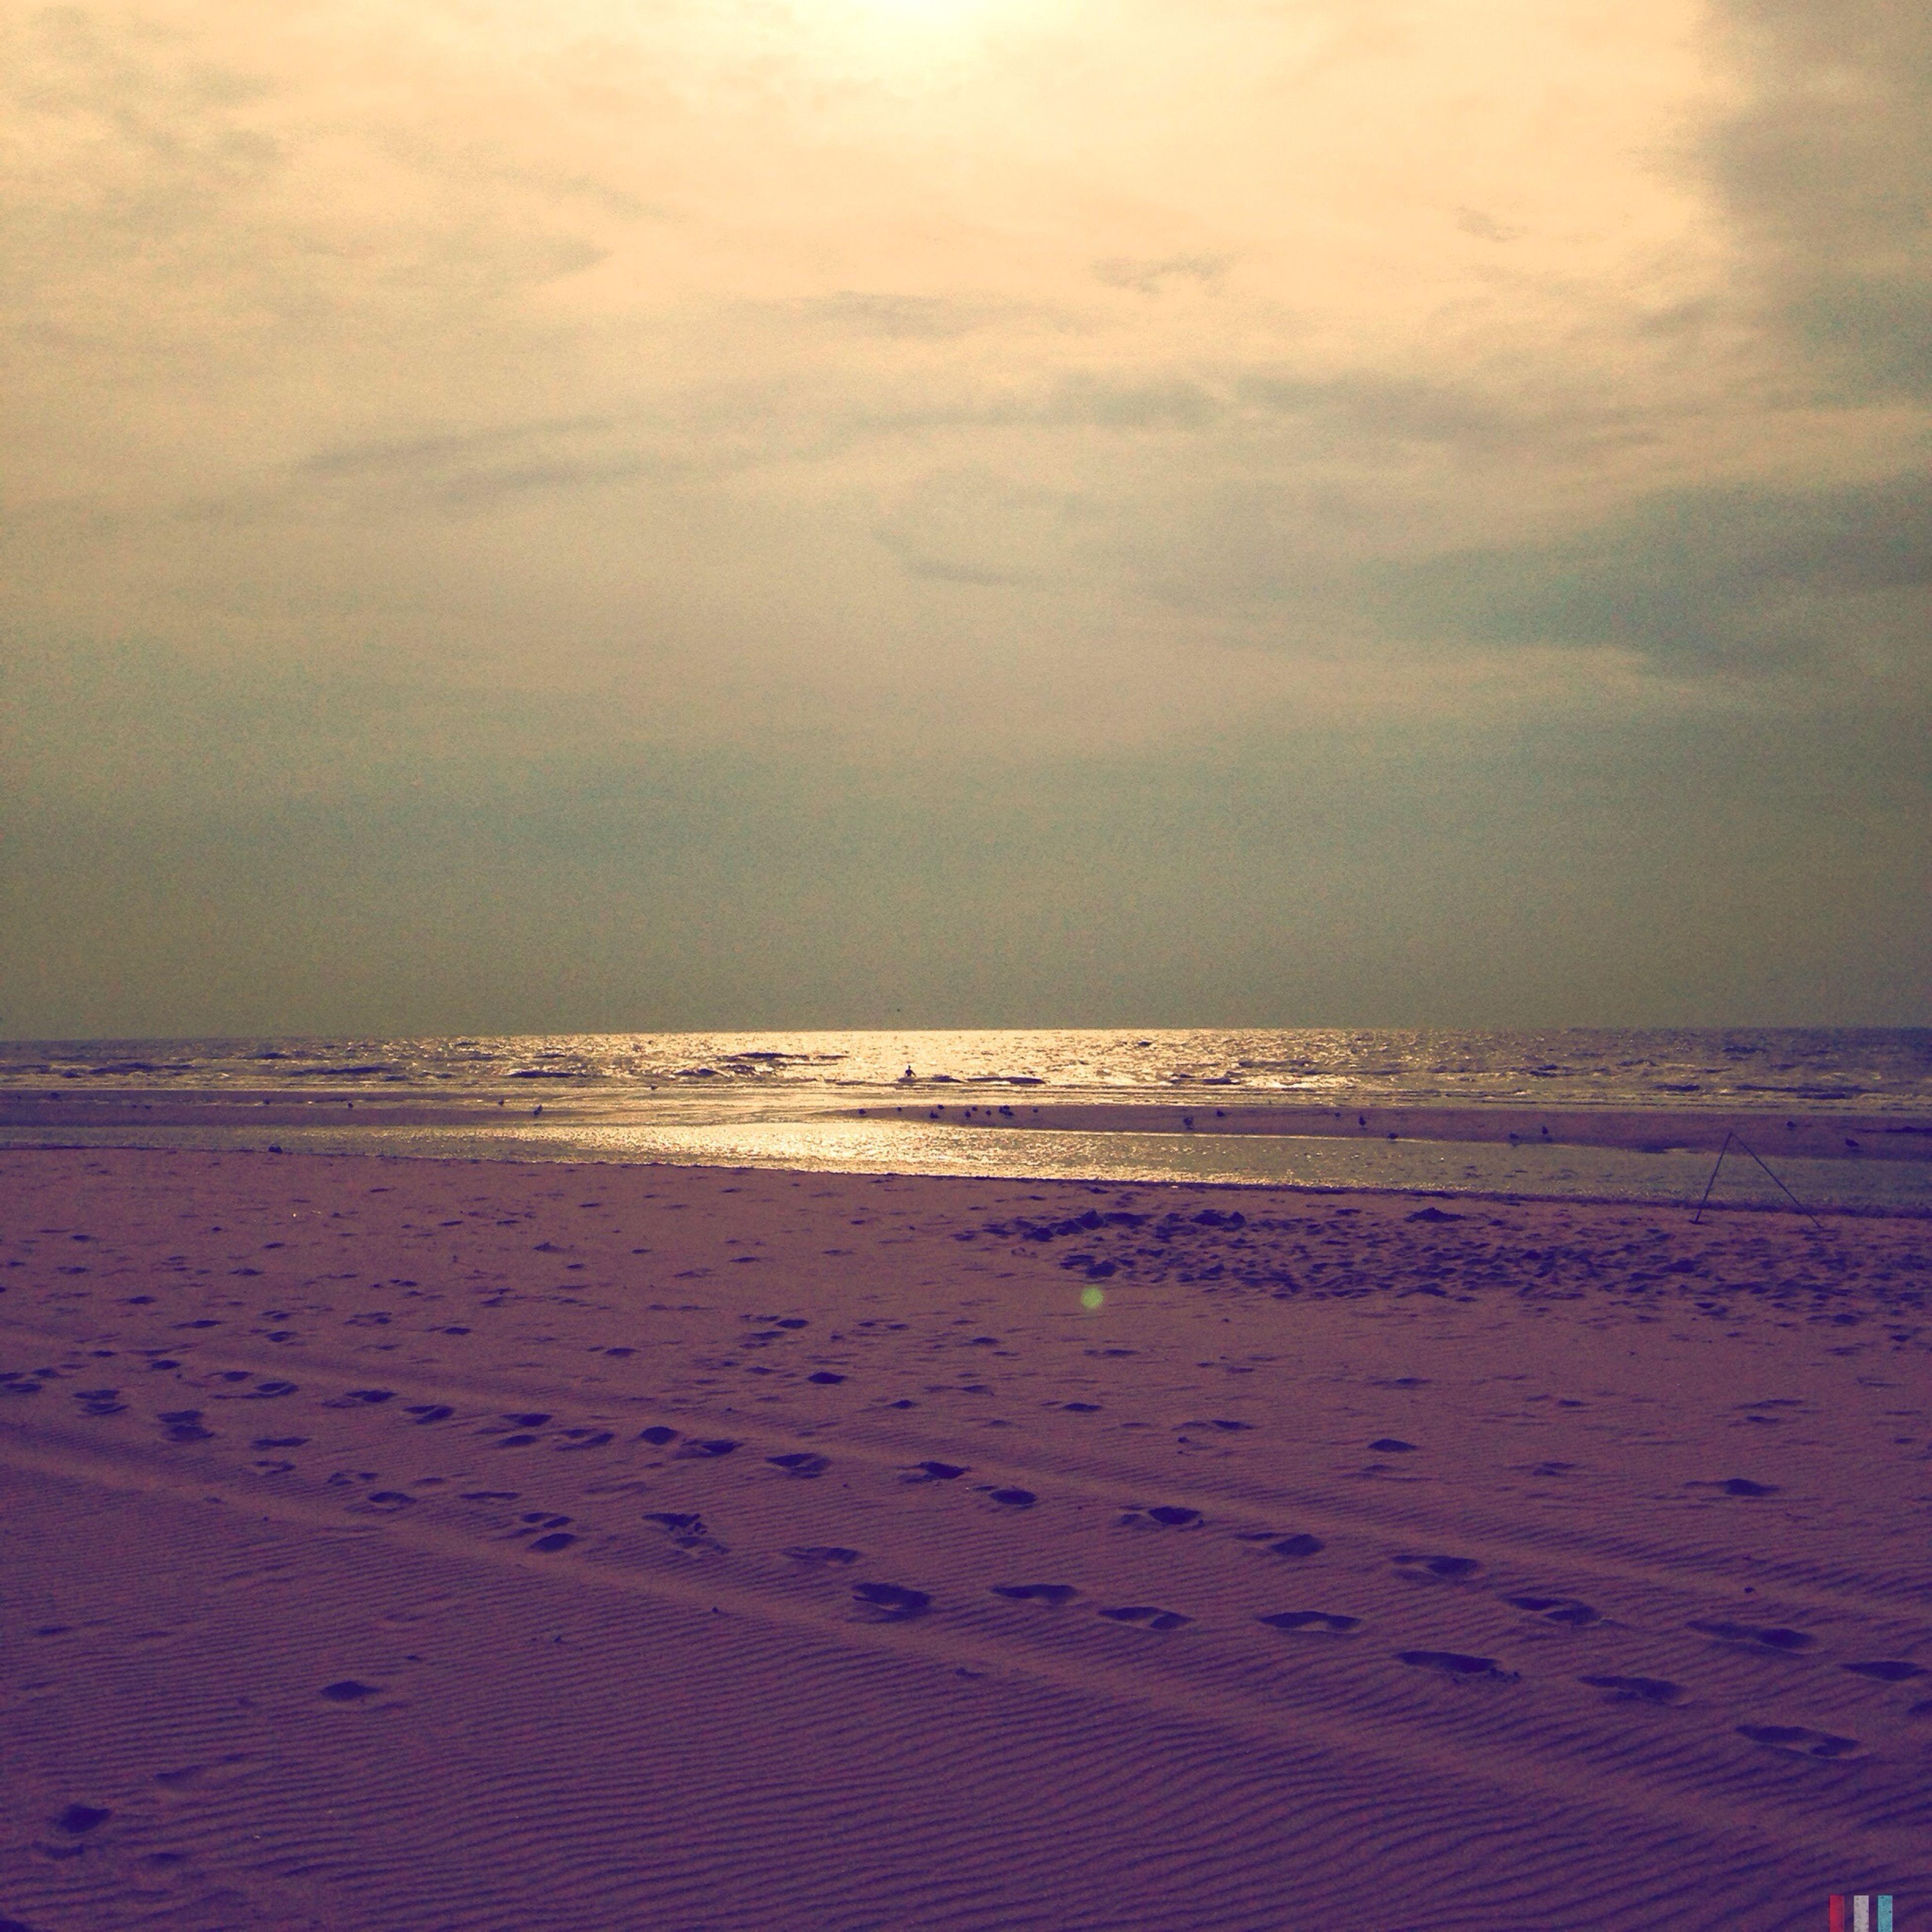 beach, sea, sand, horizon over water, tranquil scene, shore, tranquility, scenics, water, sky, beauty in nature, nature, sunset, idyllic, cloud - sky, coastline, remote, calm, wave, non-urban scene